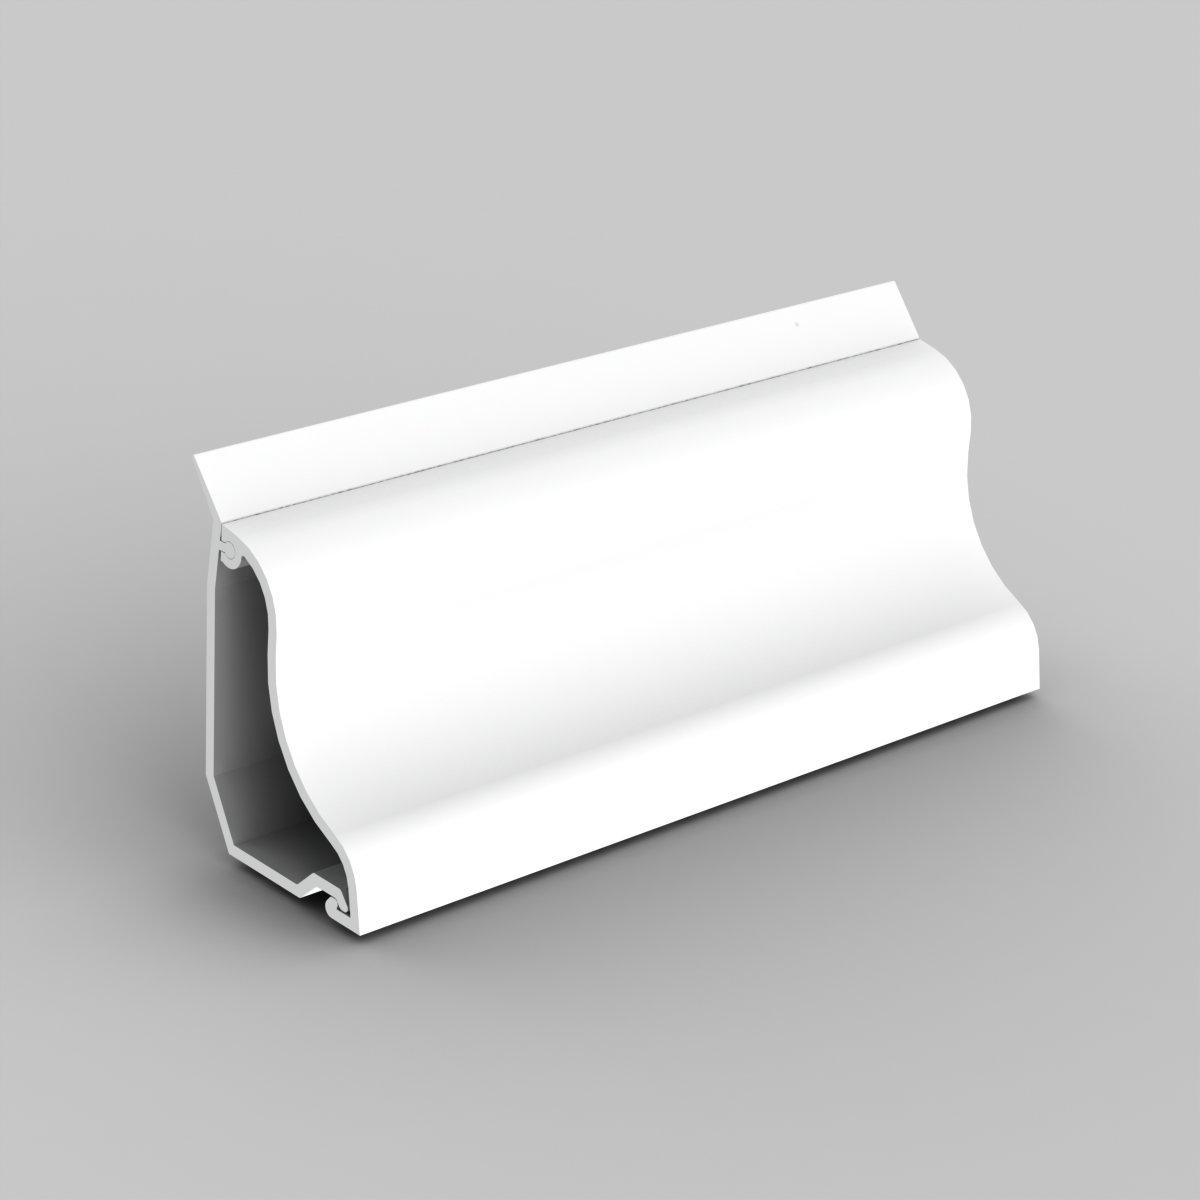 Lišta podlahová LP 35 bílá (LP 35_HD)